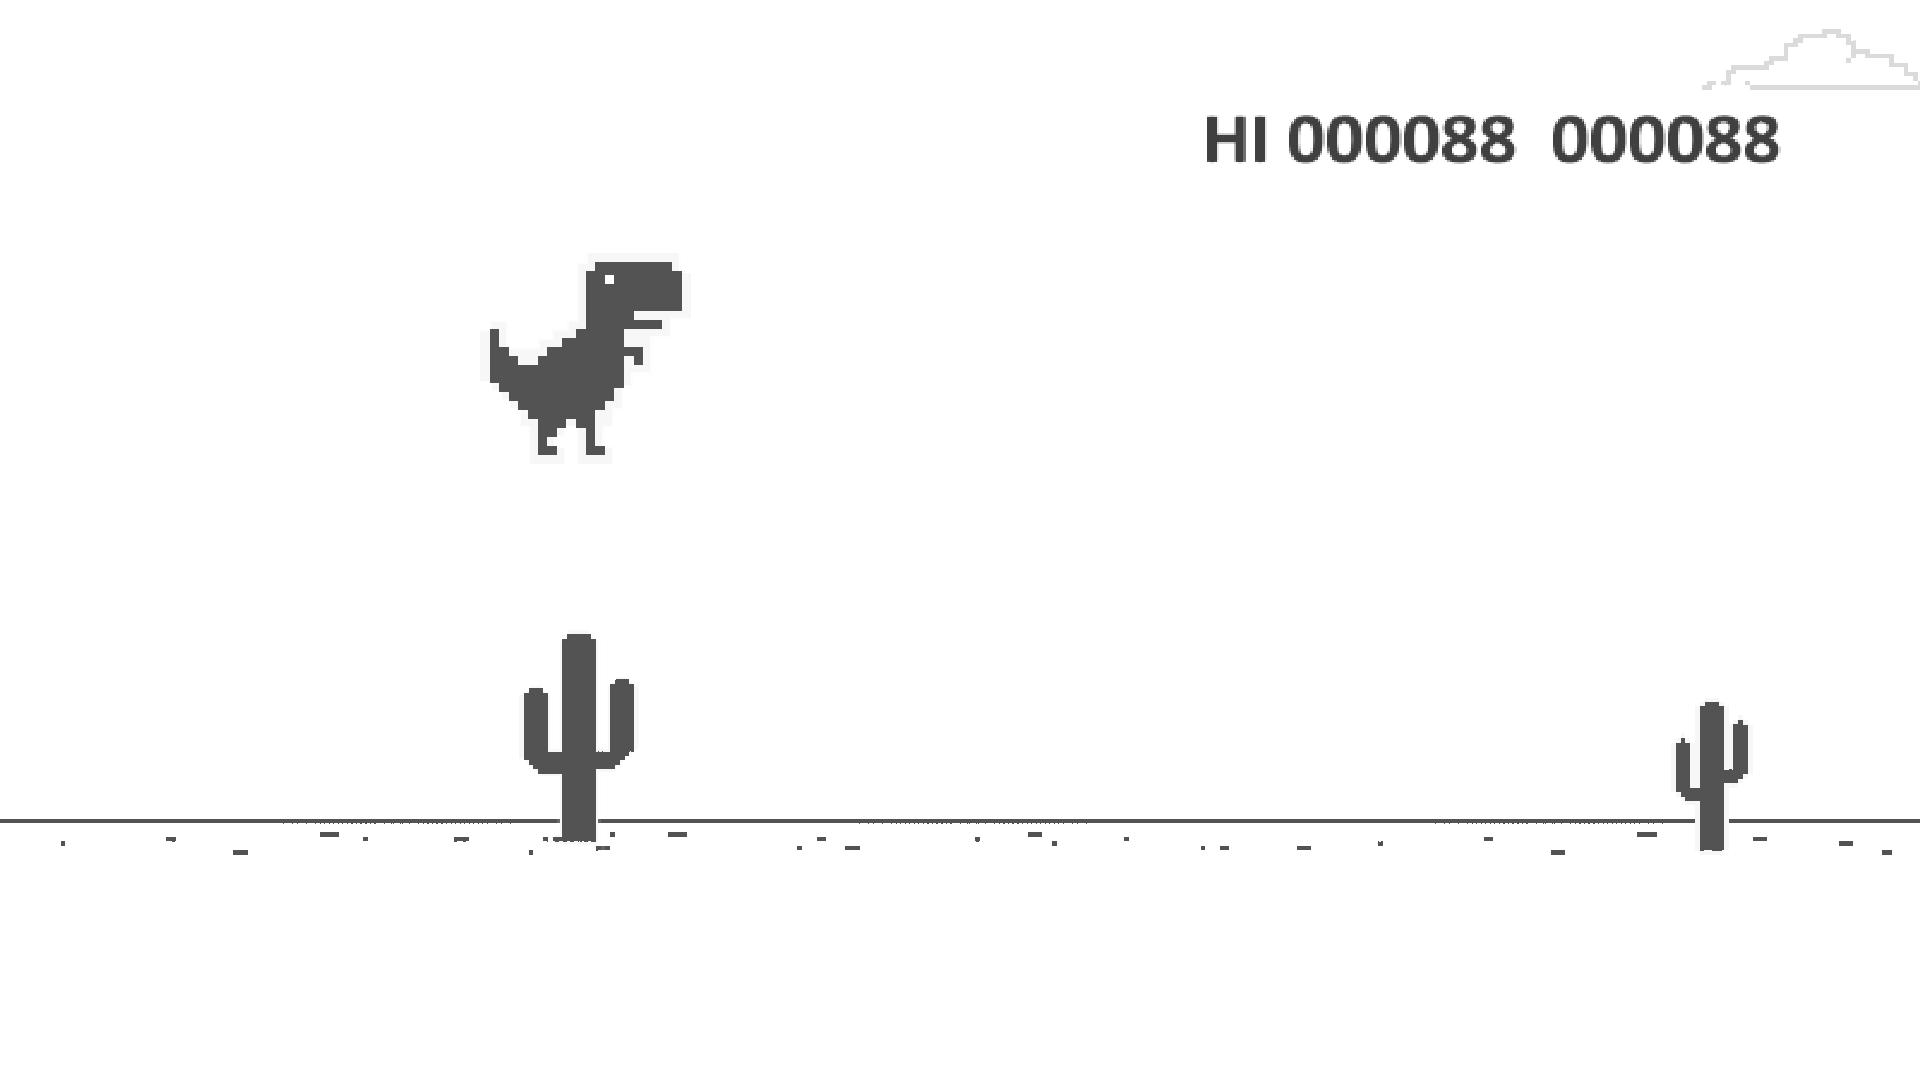 Dino T-Rex для Android Аркады  - screenshot_2017-01-15-16-09-46-267_com.deerslab.dinotrex-1